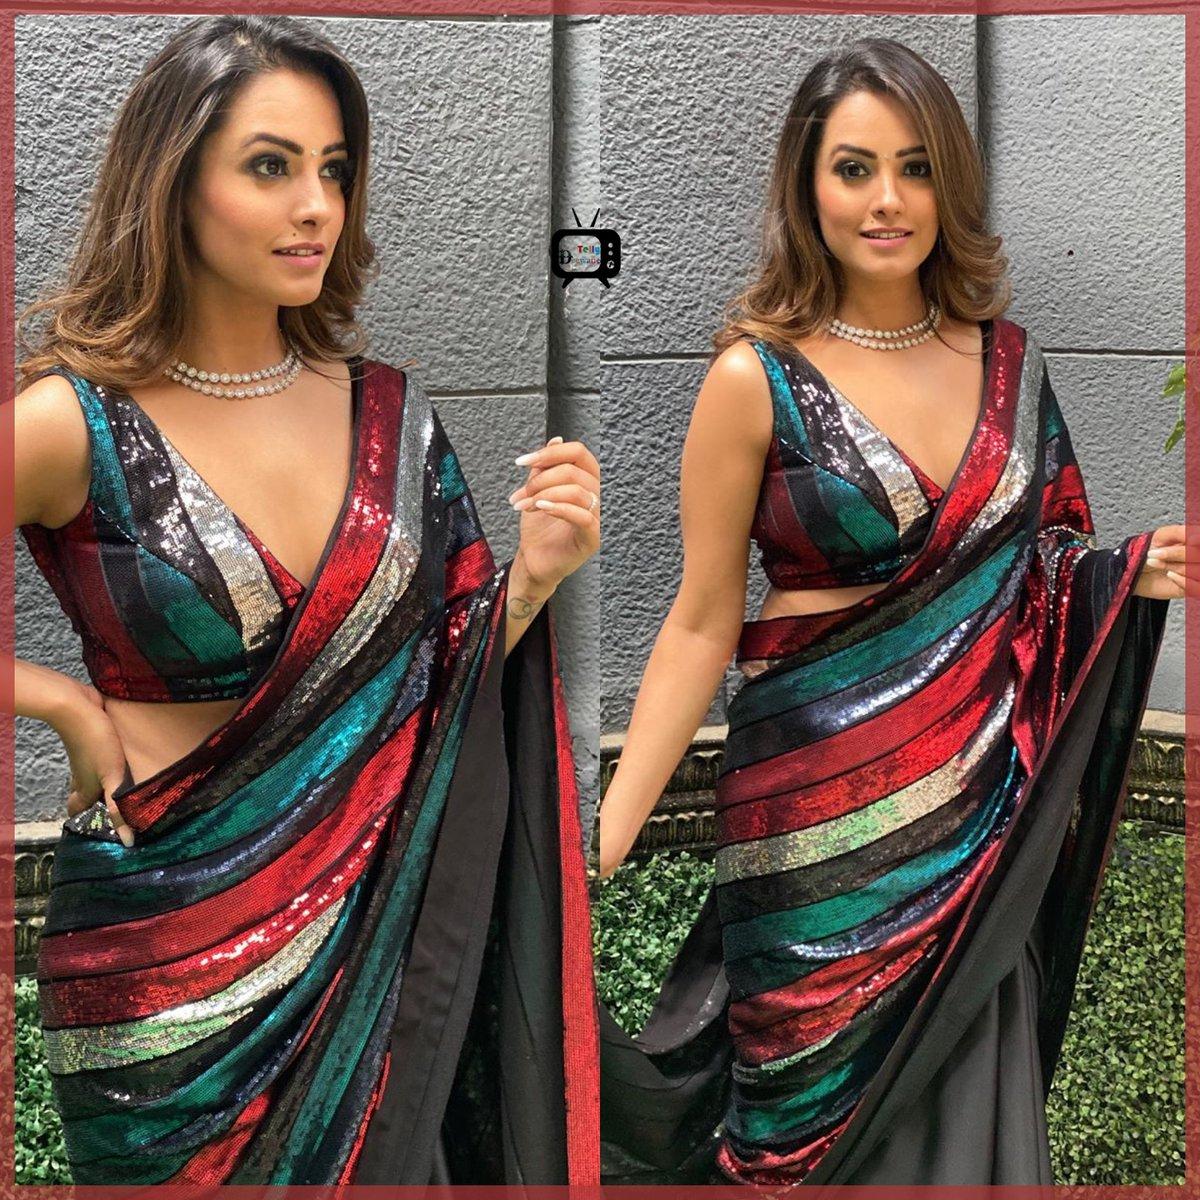 Gorgeous Anita Hassanandani #AnitaHassanandani #Naagin4  #AnitaHassanandaniReddy #Vishaka #Vish  #Naagin3 #Shagun #YHM  @TellyDeewanepic.twitter.com/QDg5wIW1Z7